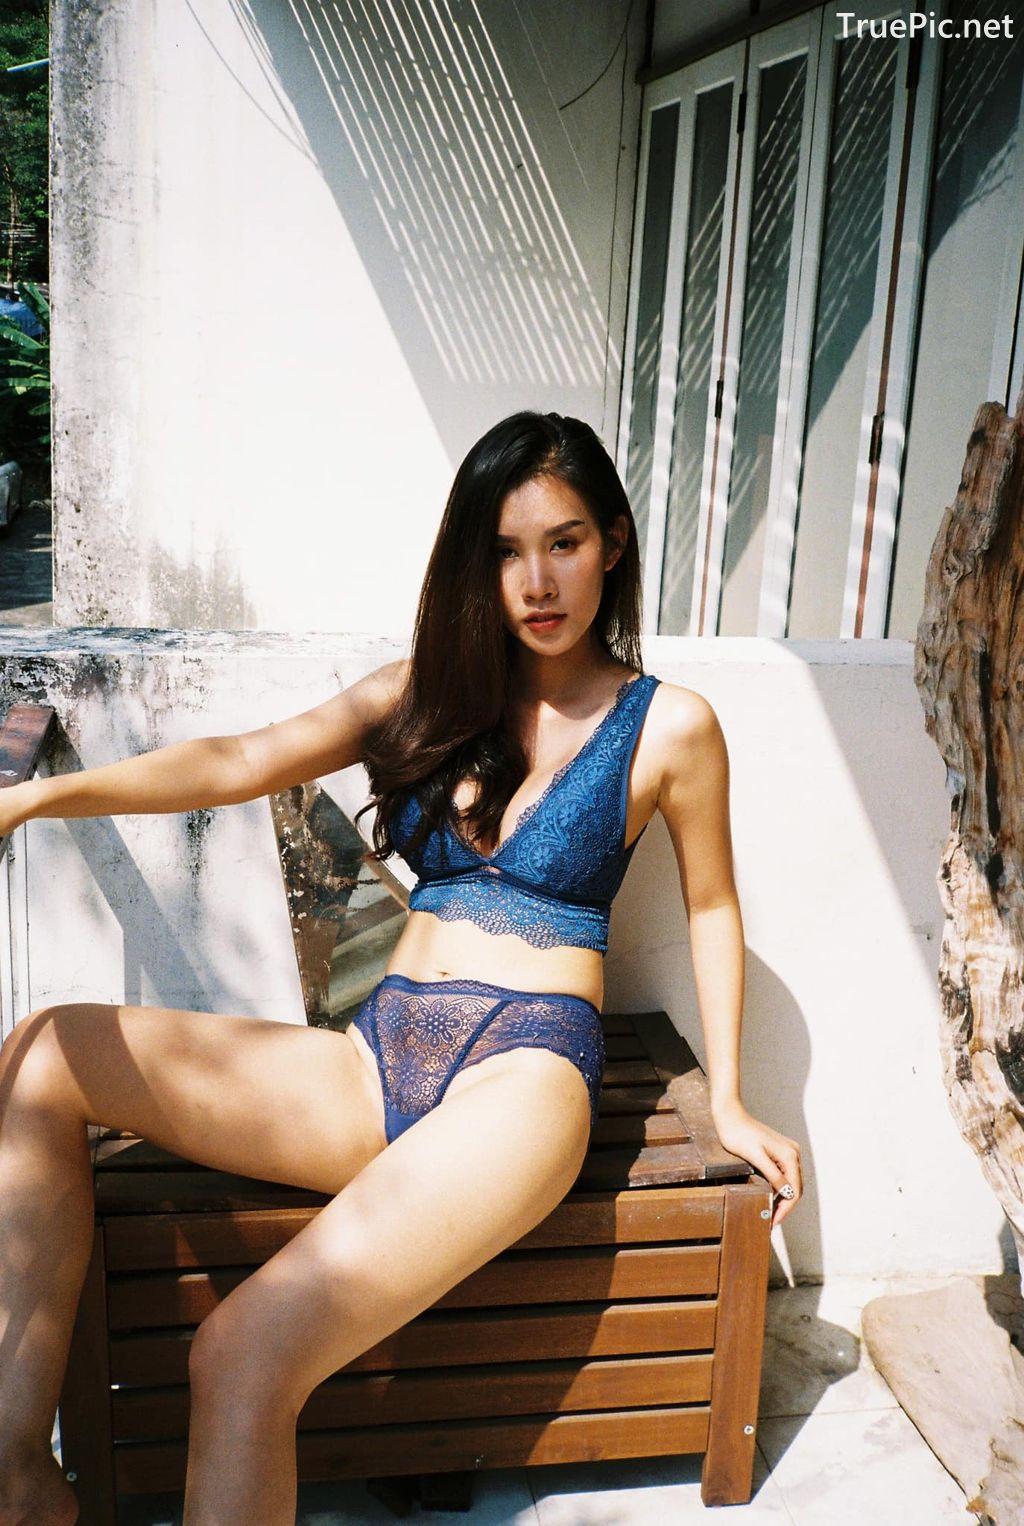 Image-Thailand-Model-Ssomch-Tanass-Blue-Lingerie-TruePic.net-TruePic.net- Picture-27